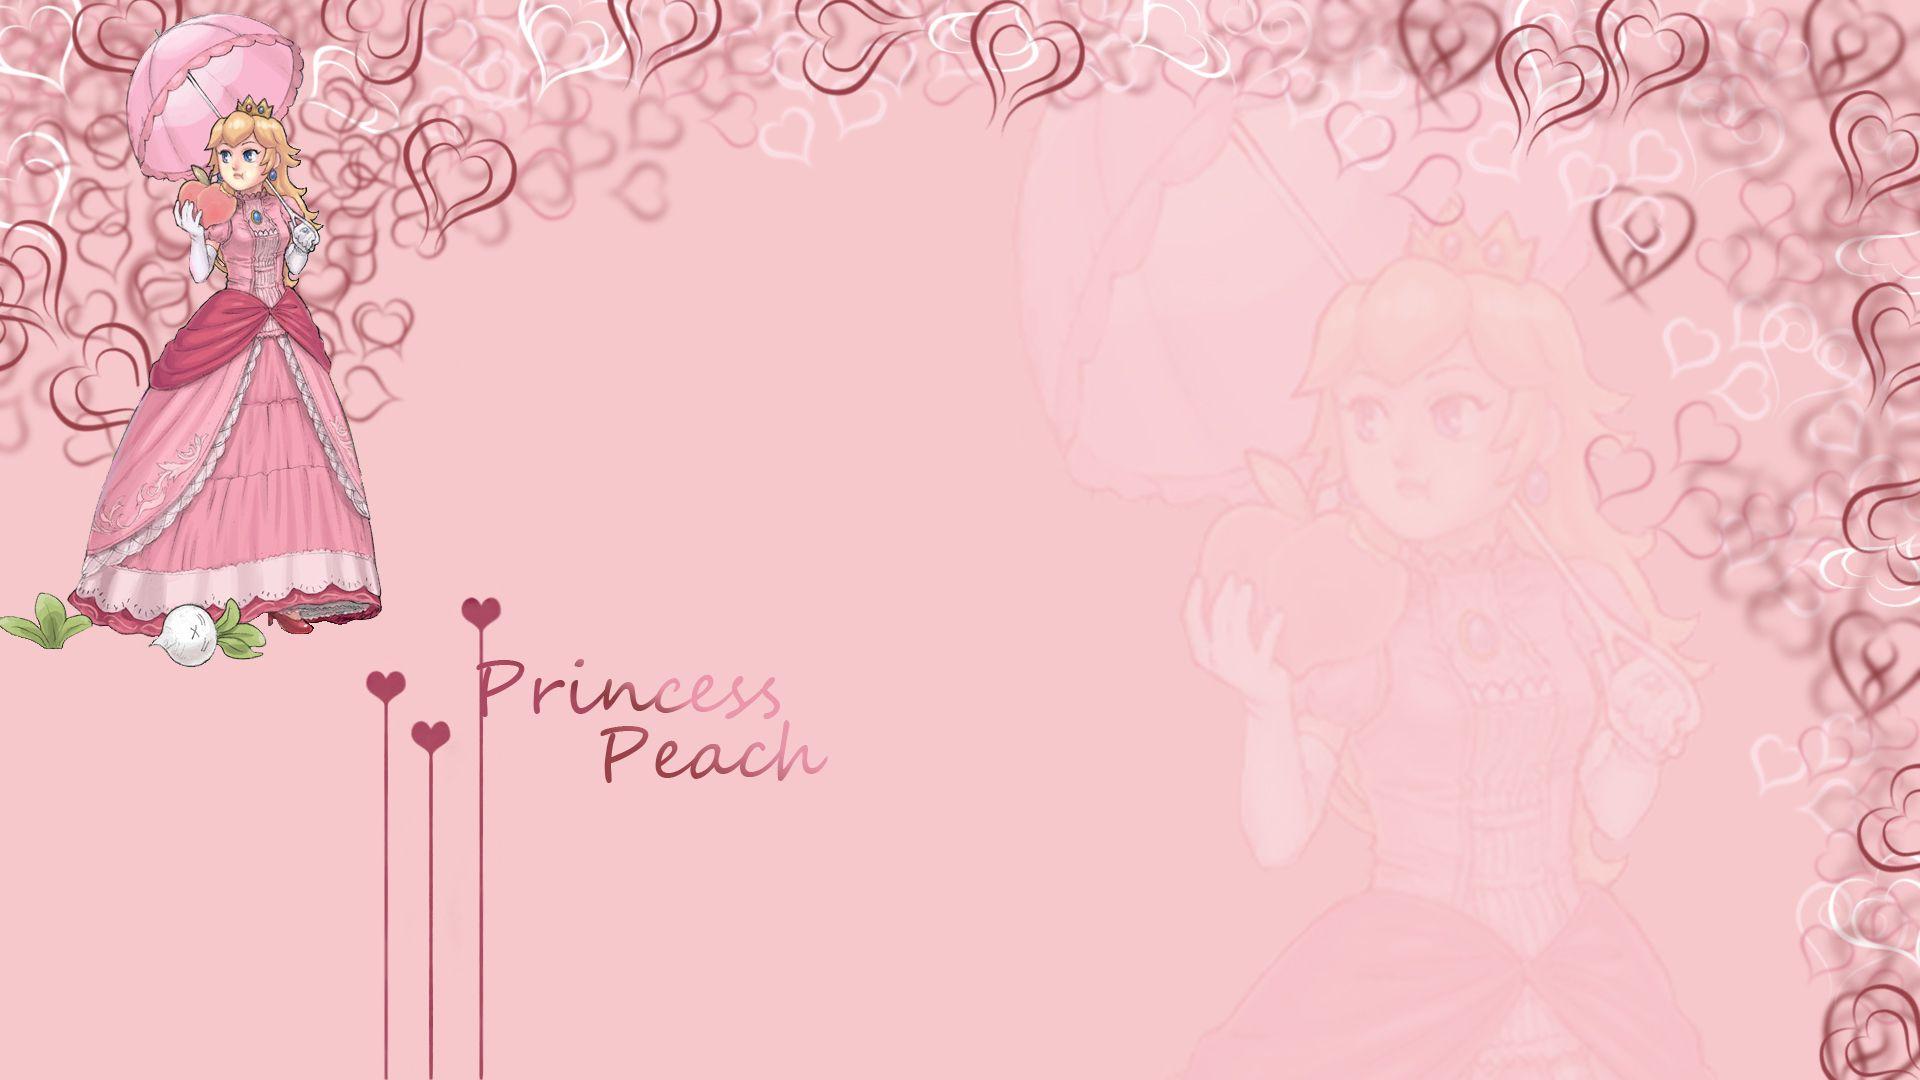 disney princess wallpapers best wallpapers hd wallpapers disney princess wallpapers best wallpapers